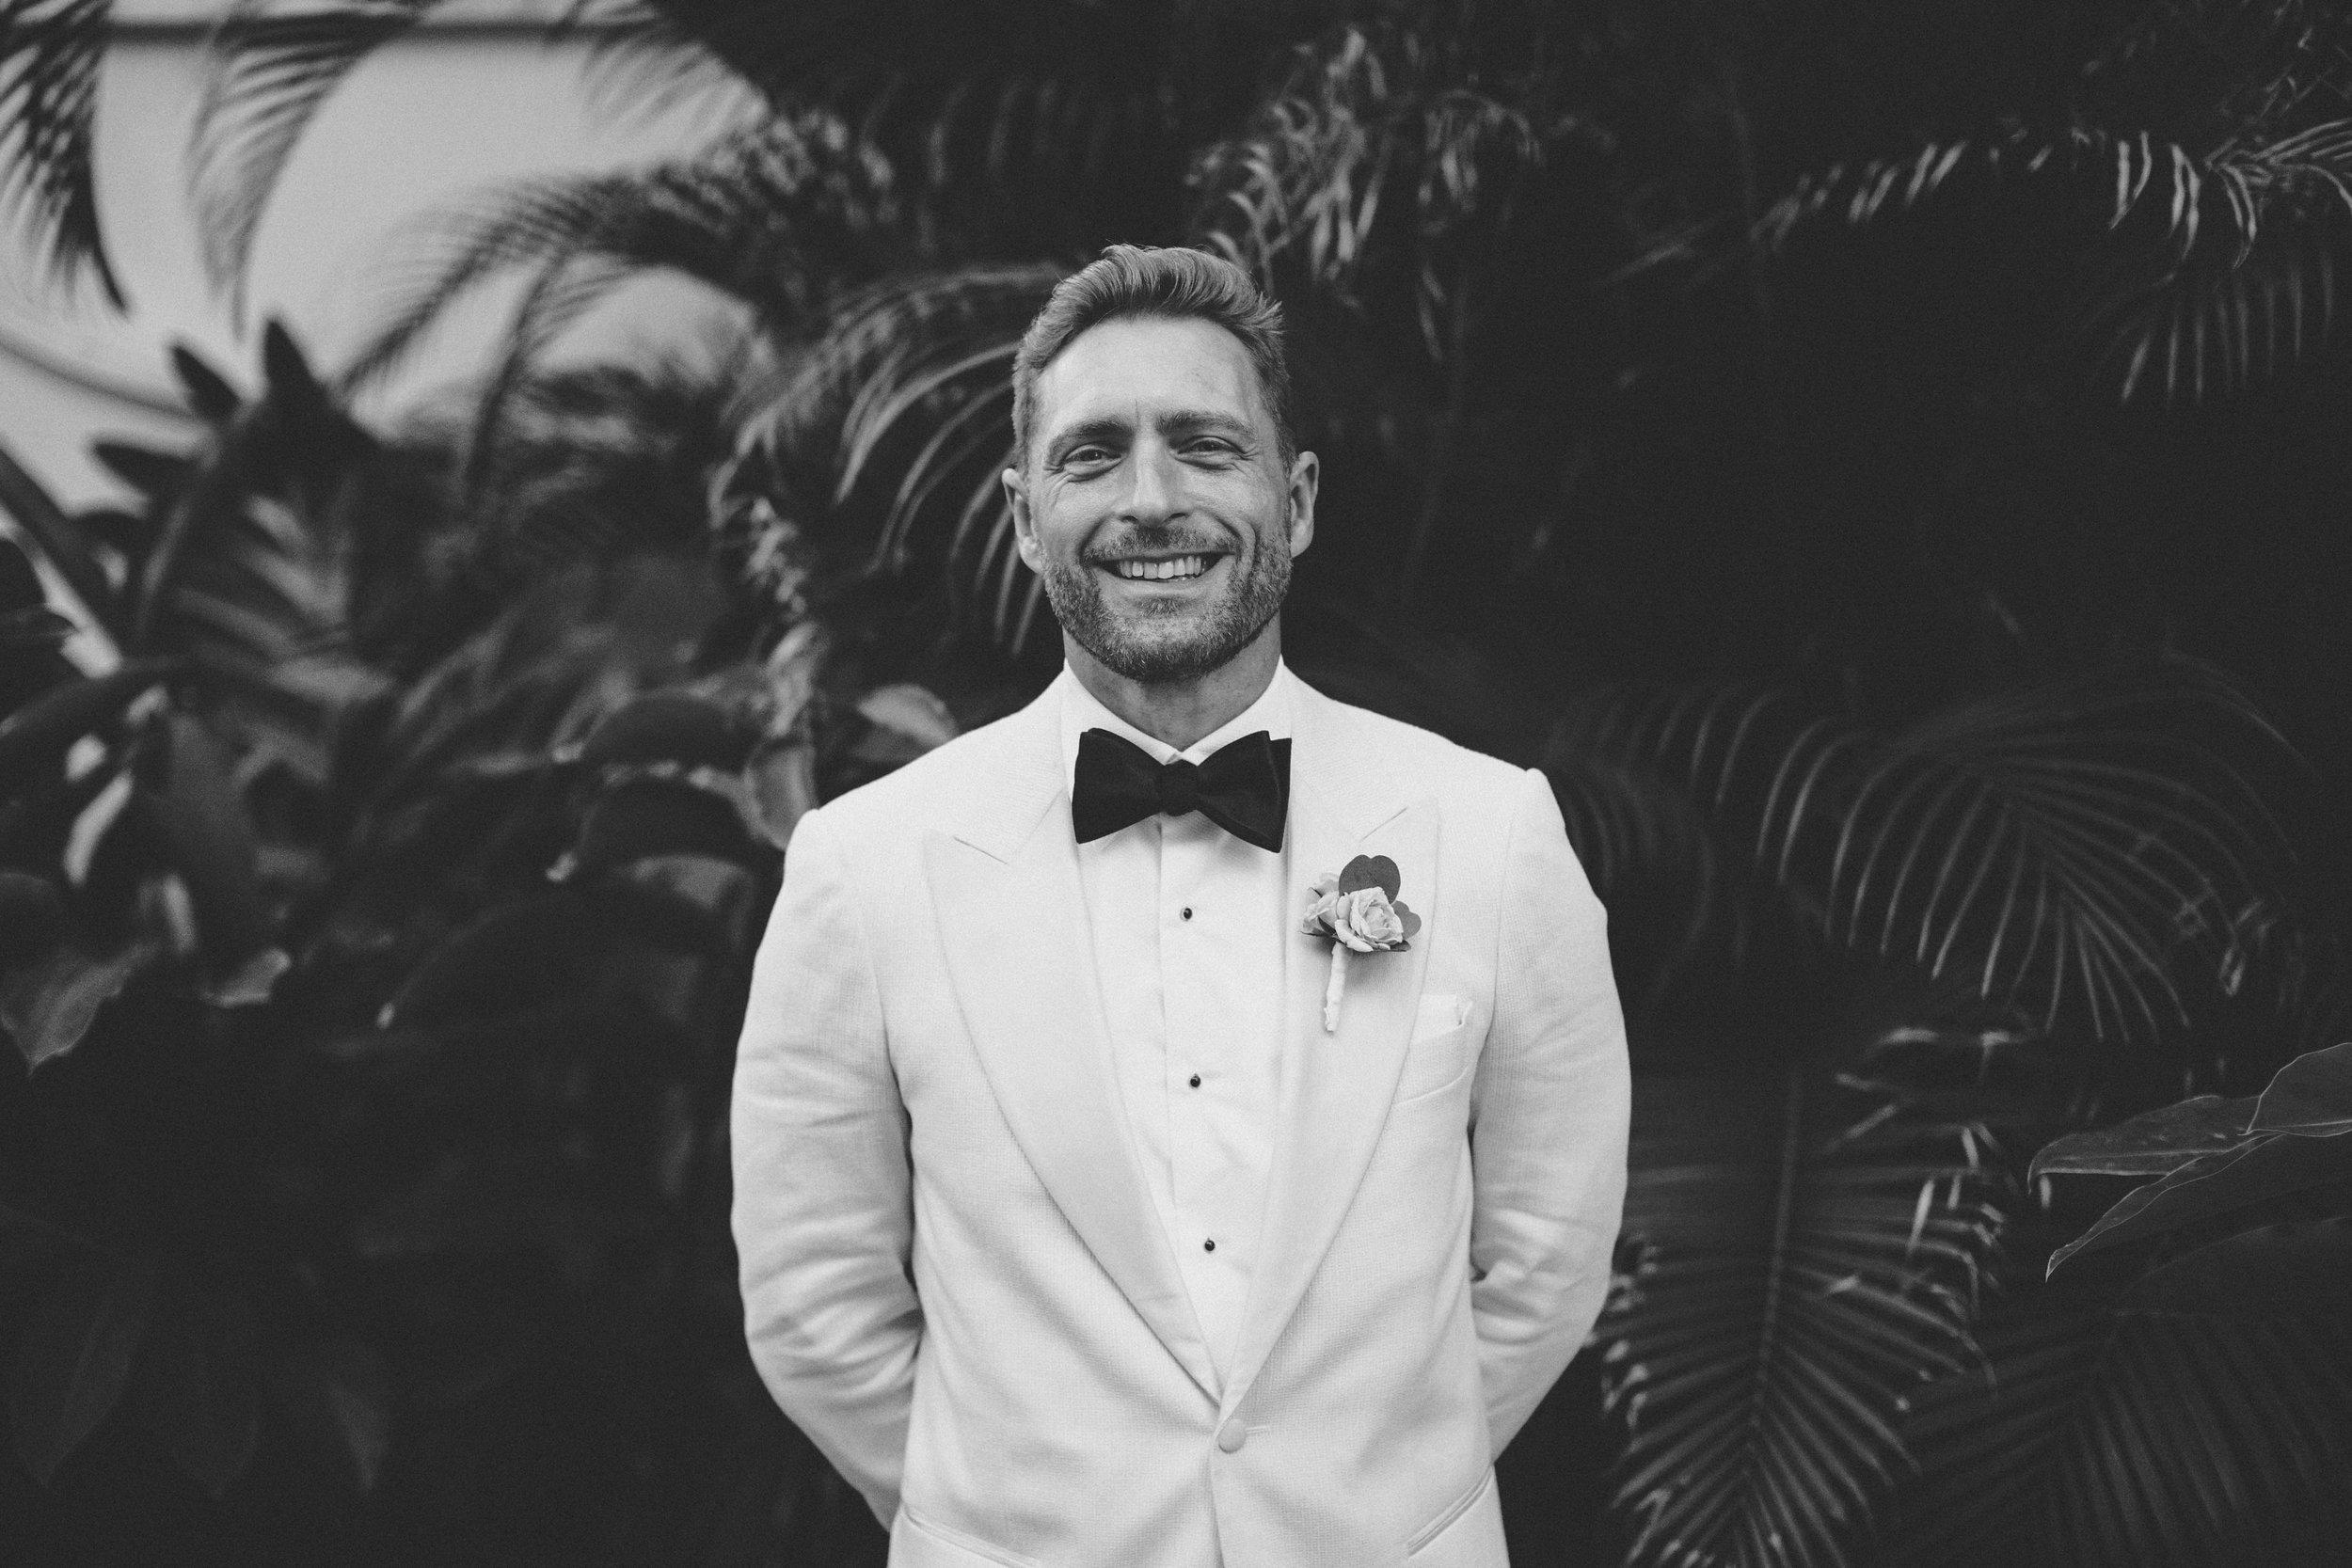 mexico_wedding_cancun_villa_la_joya_evangeline_lane_108c.jpg